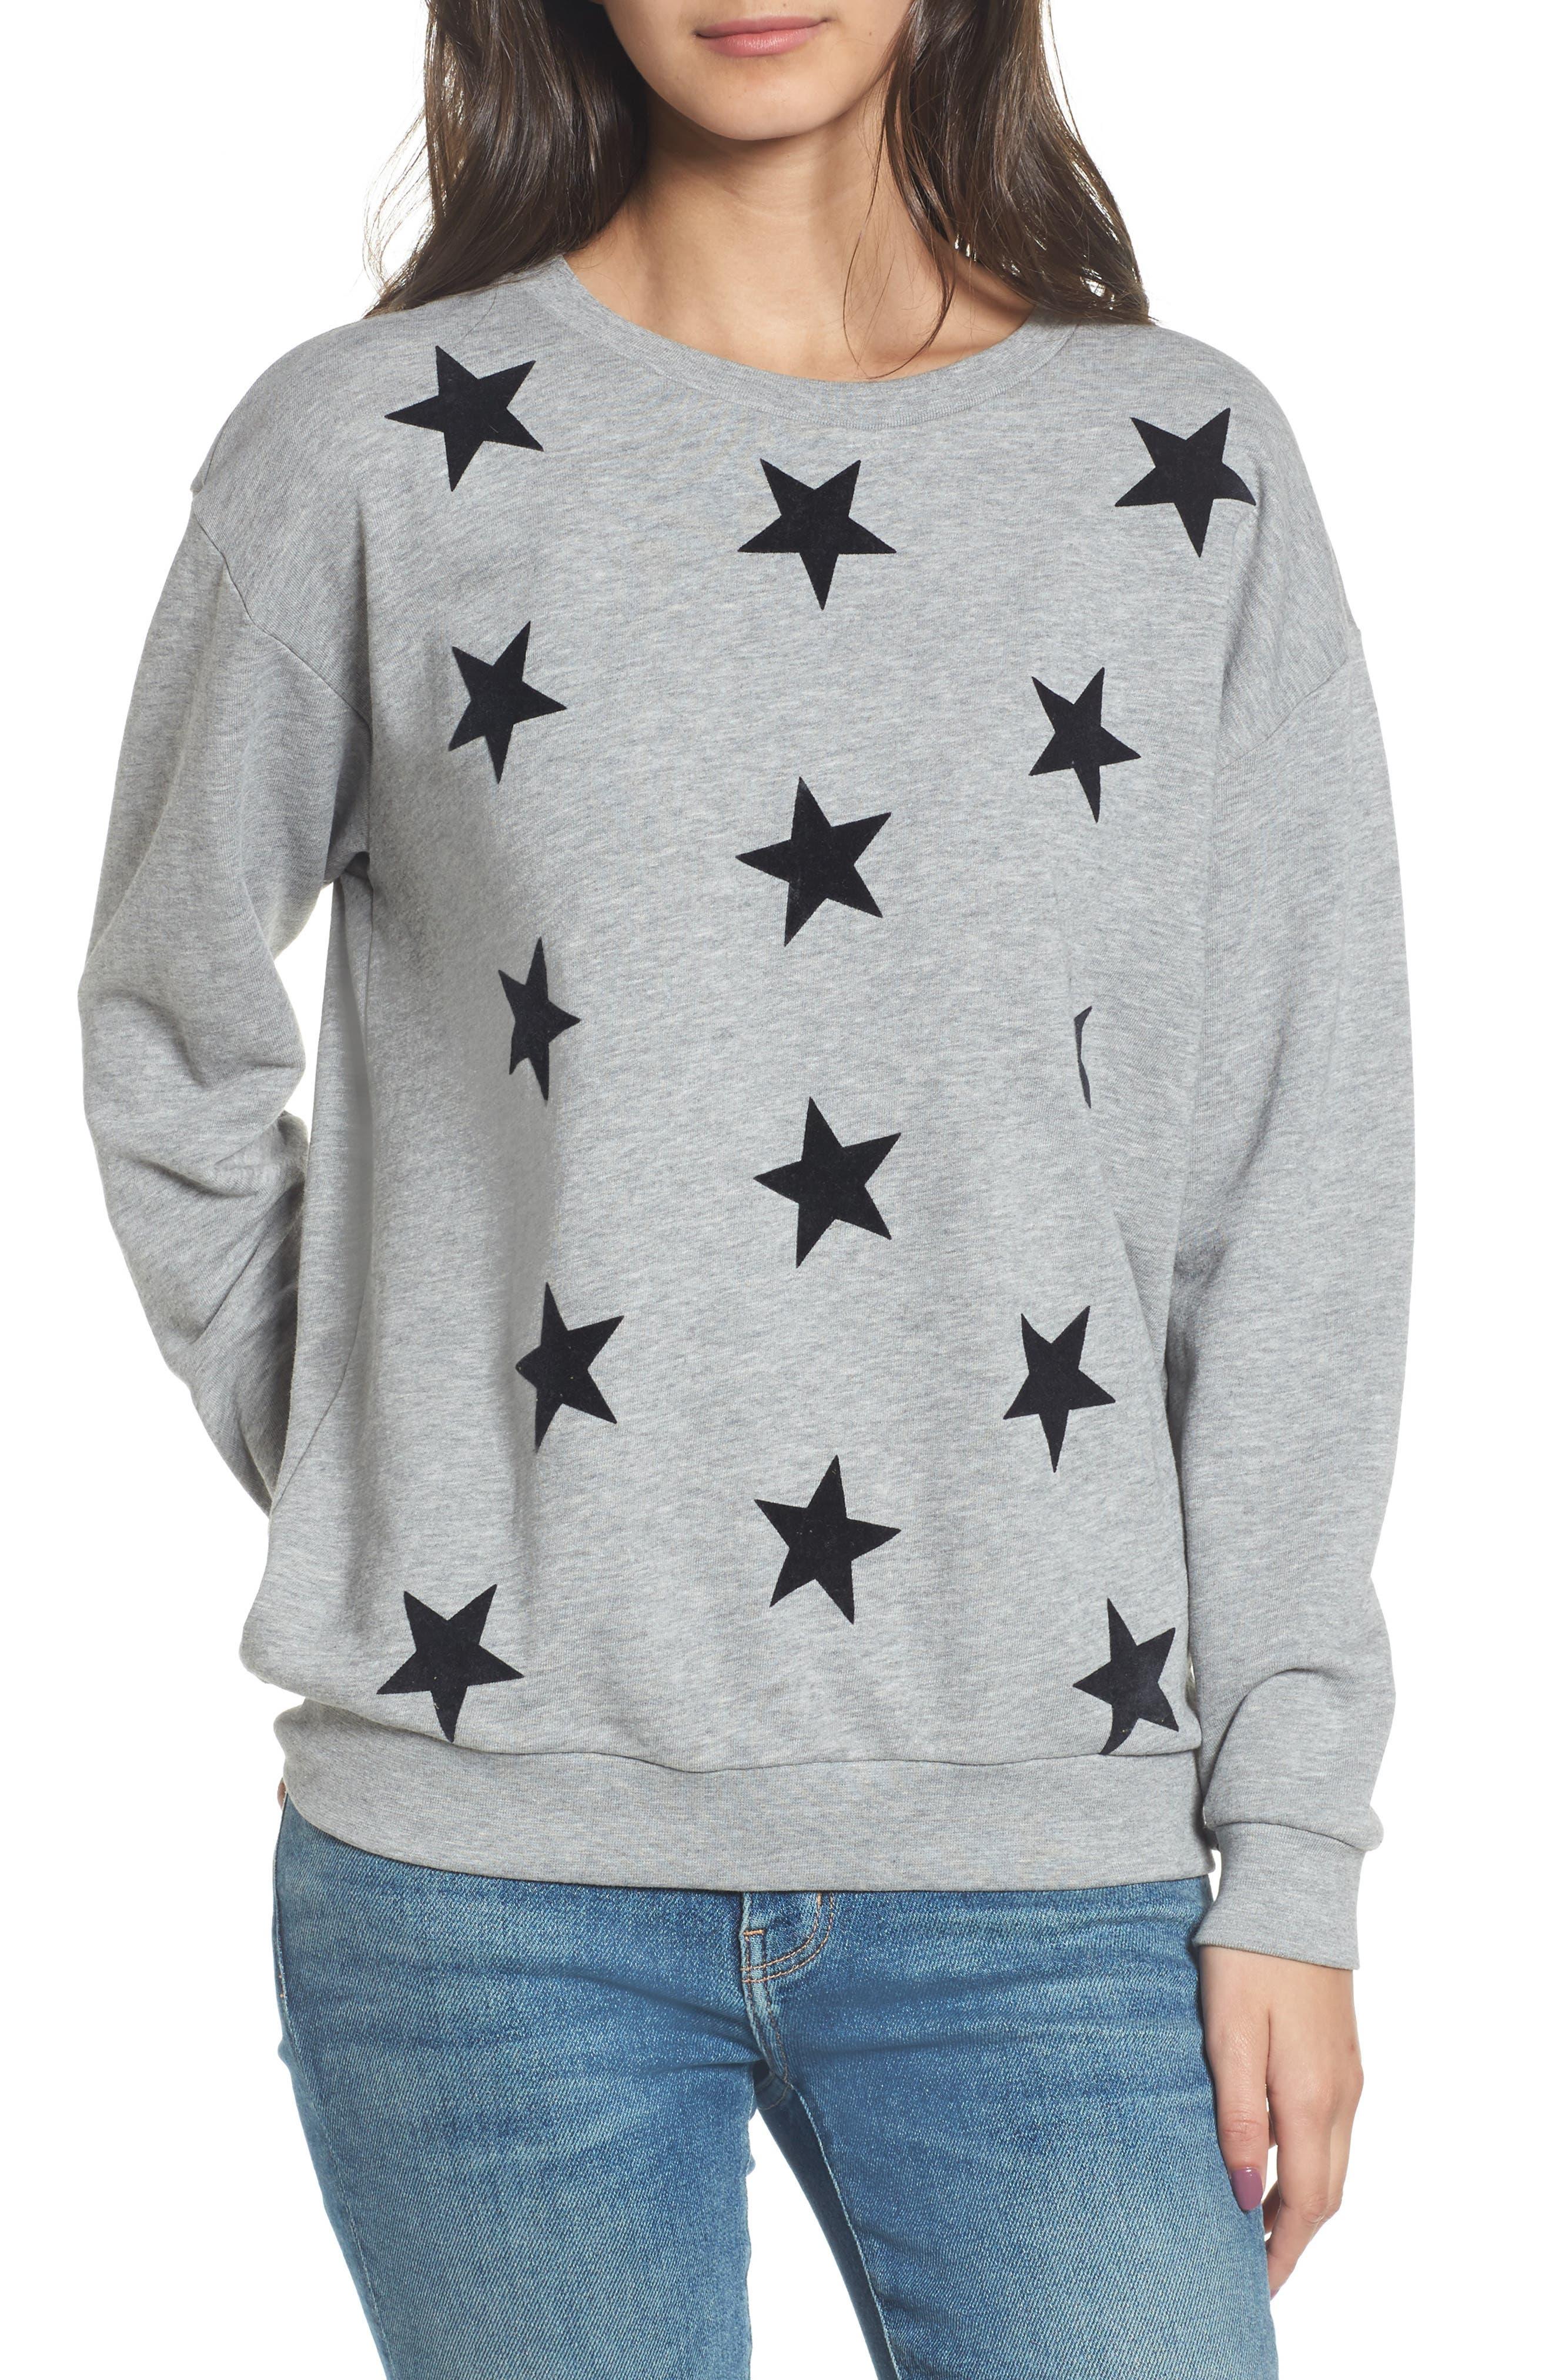 Alexa - Super Stars Sweatshirt,                             Main thumbnail 1, color,                             020